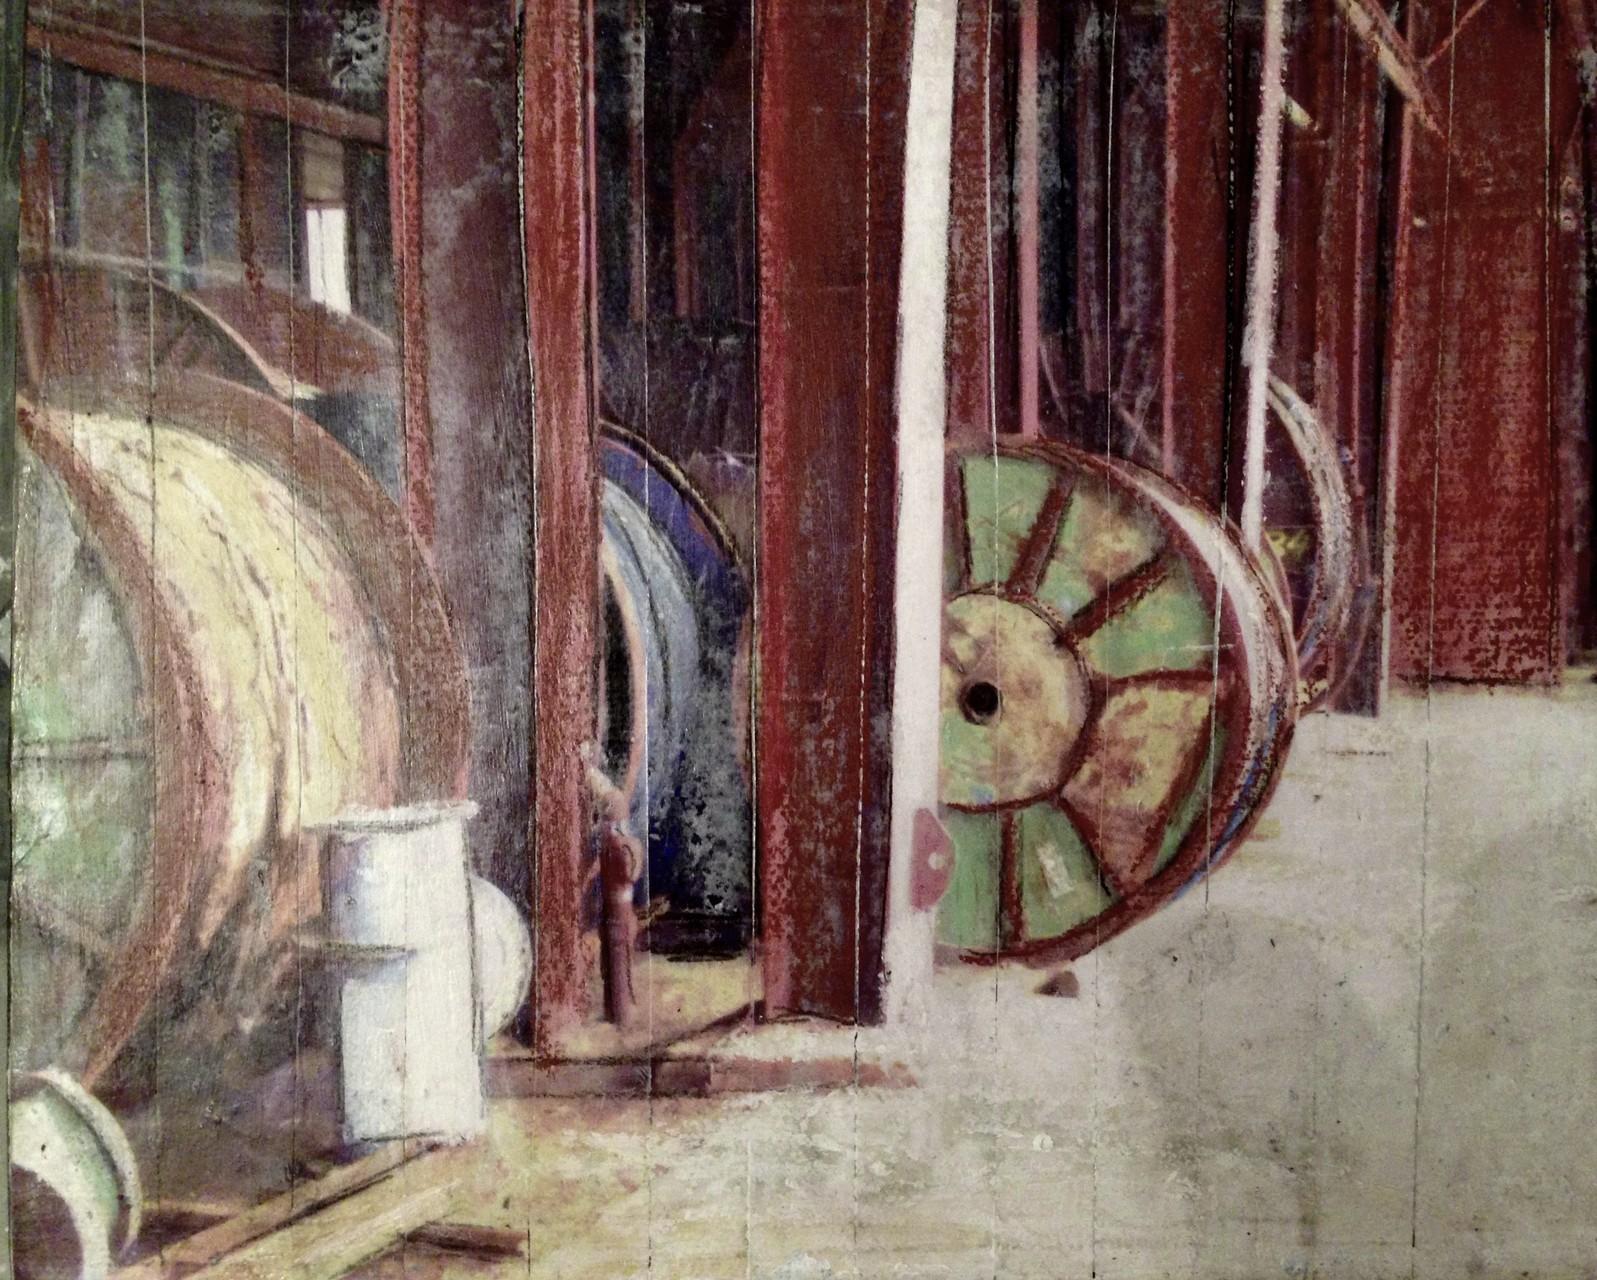 Zeche Zollverein - Spulen (18x24cm)